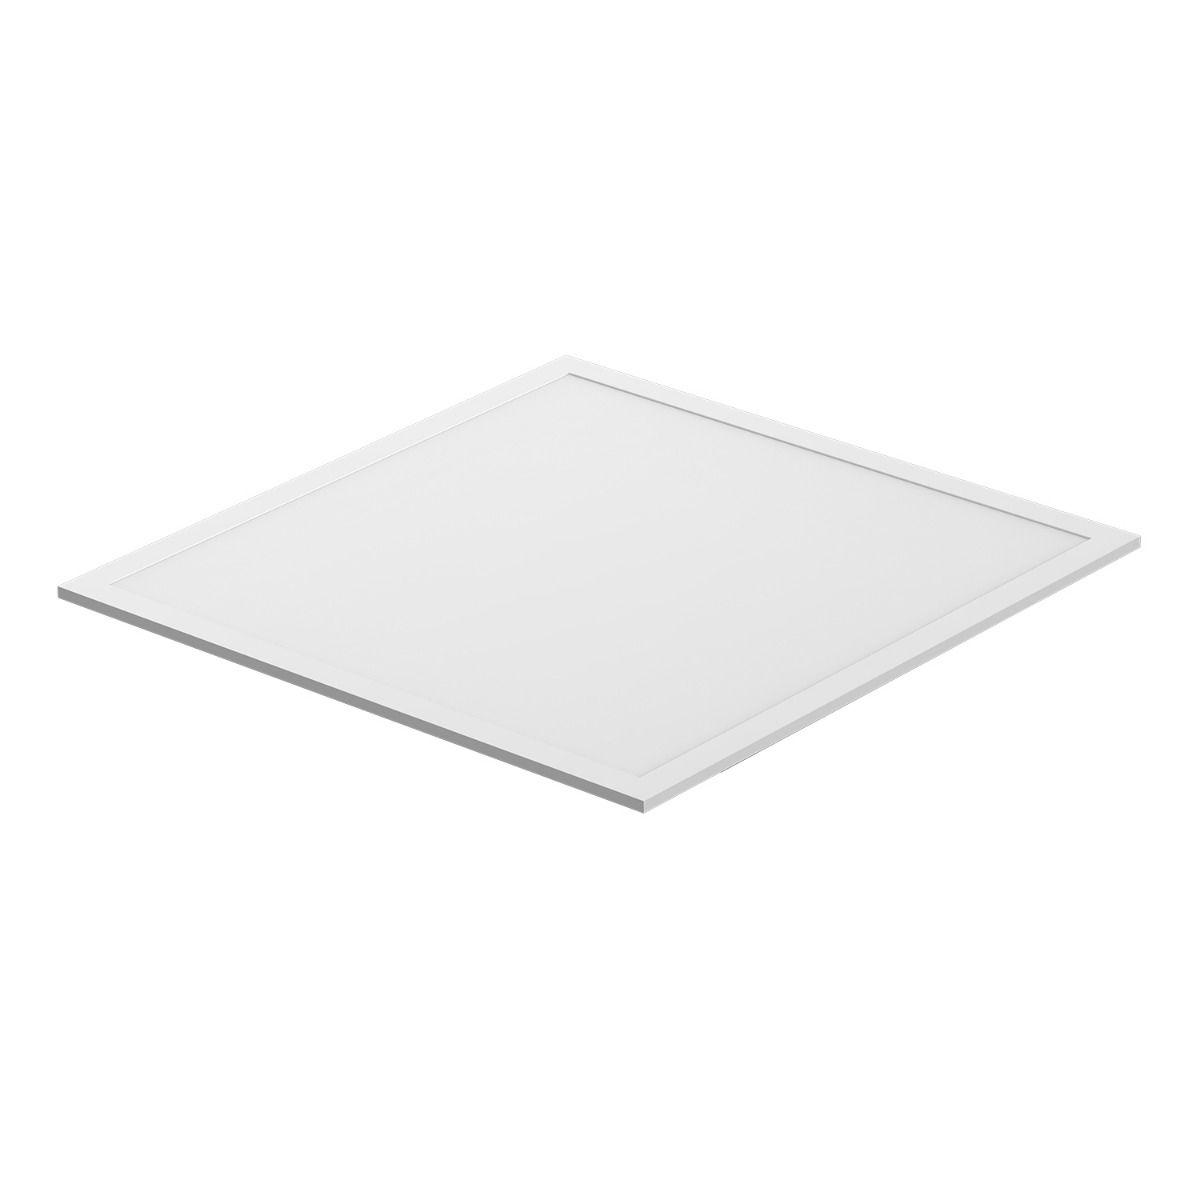 Noxion LED Panel Delta Pro V2.0 Xitanium DALI 30W 60x60cm 6500K 4110lm UGR <19   Dali Dimmable - Daylight - Replaces 4x18W